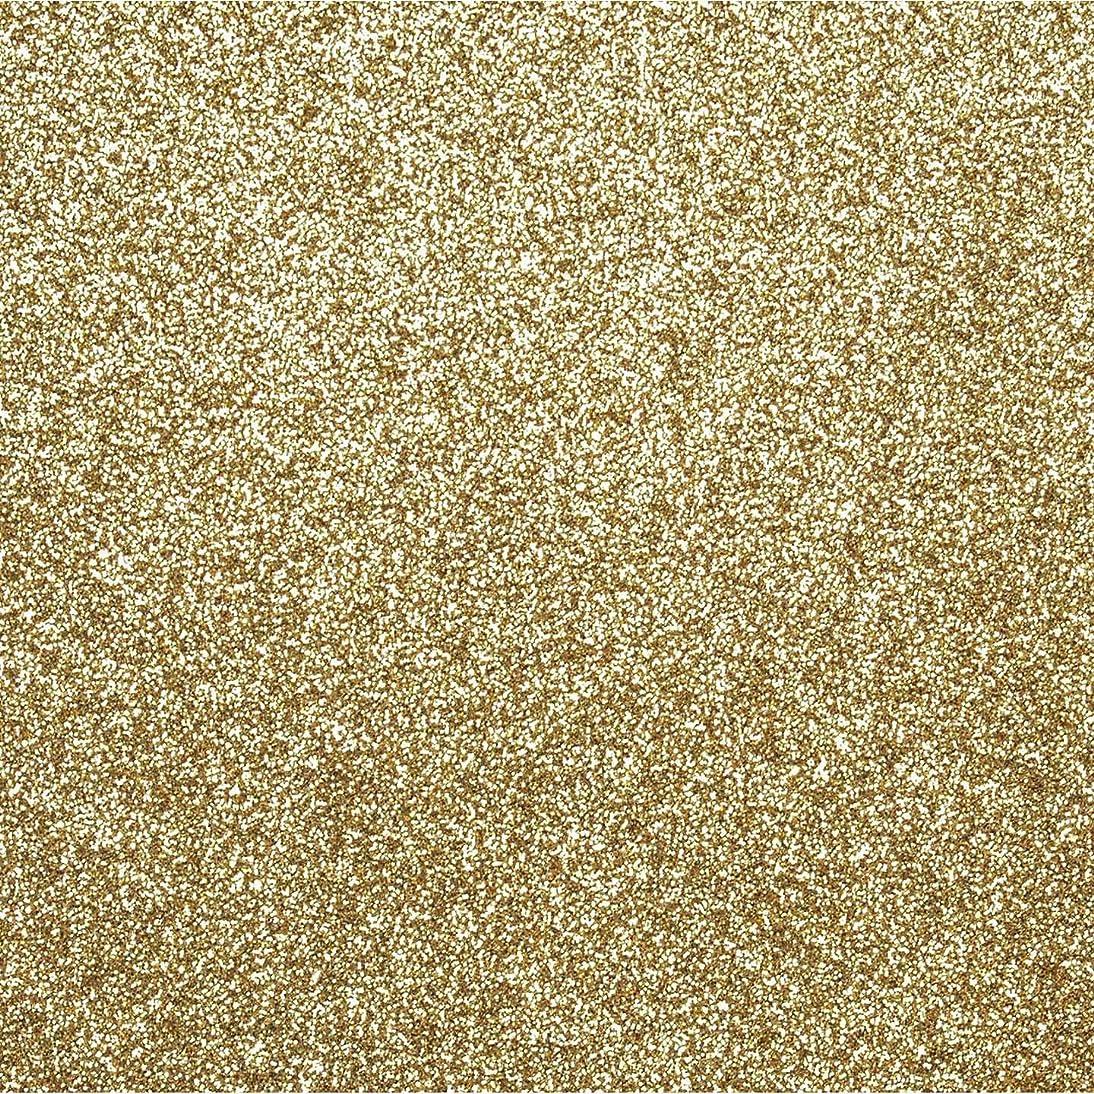 Bulk Buy: Darice DIY Crafts Sticky Back Glitter Sheet Gold 8.5 x 11 inches (10-Pack) 2511-57